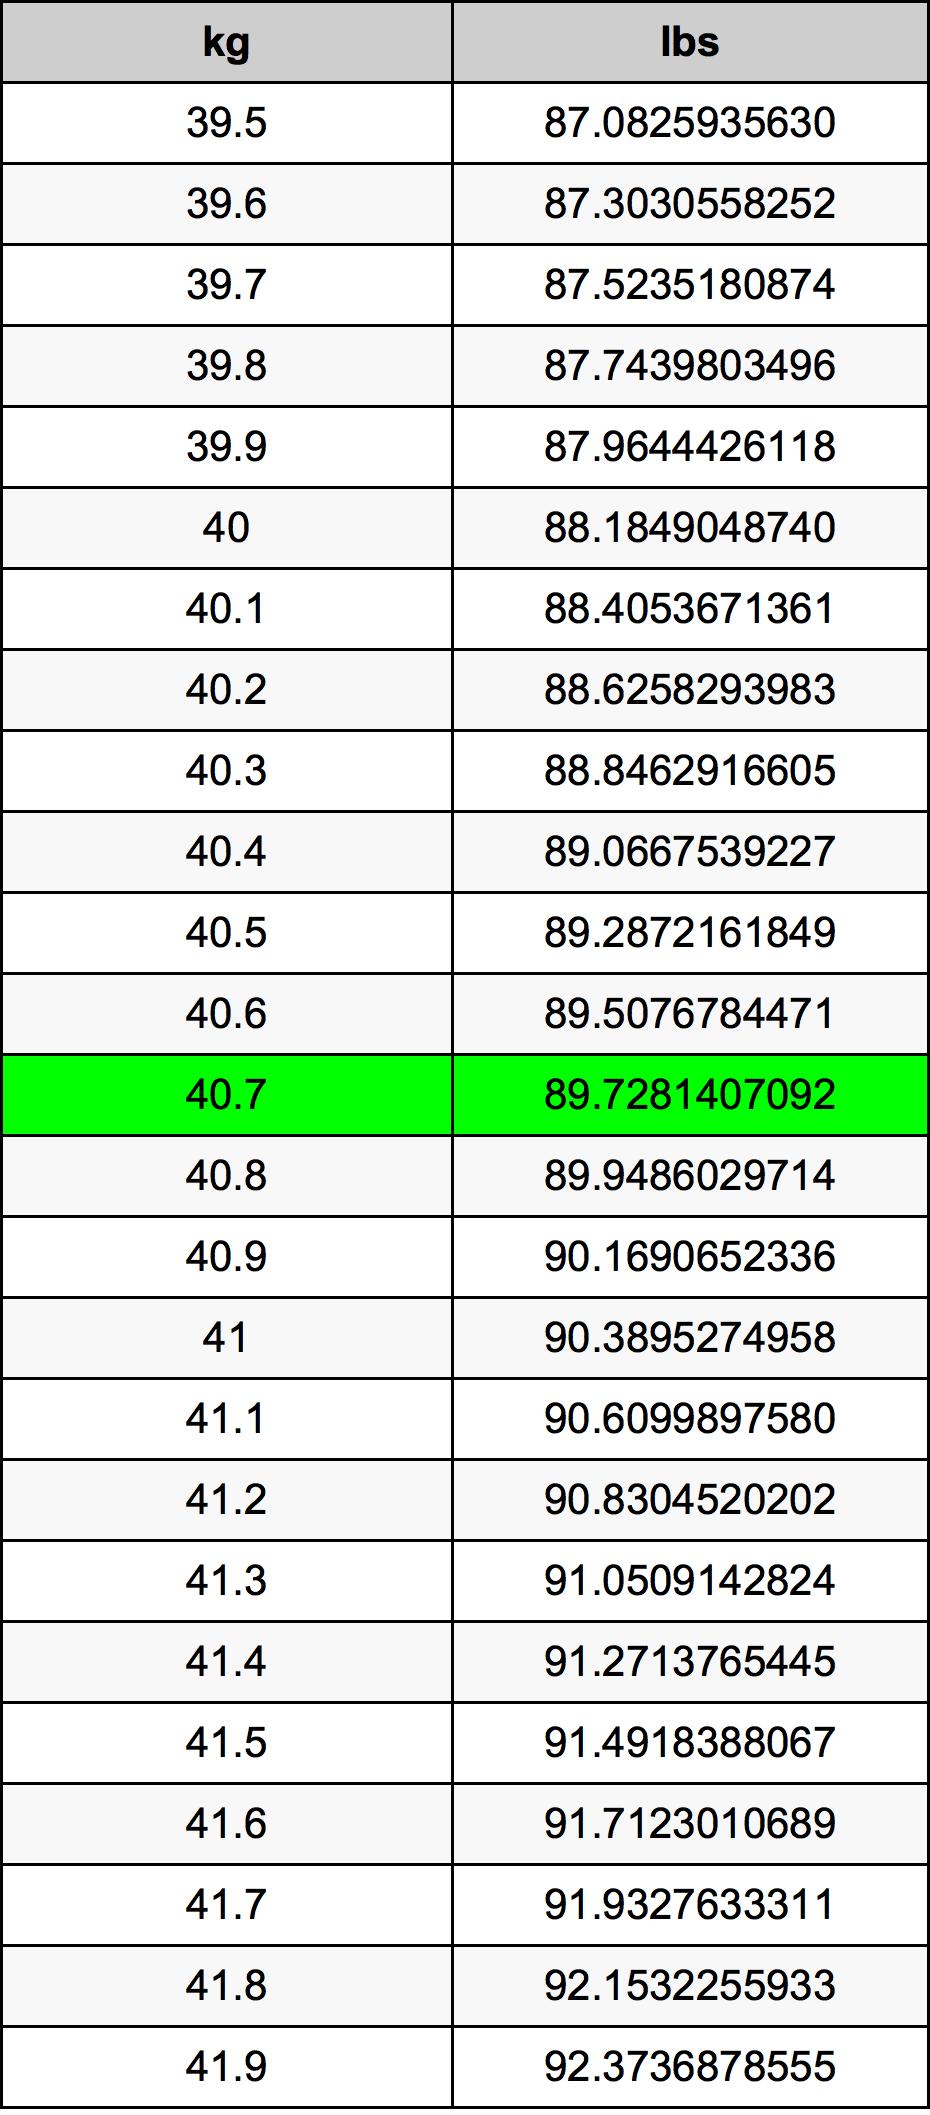 40.7 Kilogramma konverżjoni tabella